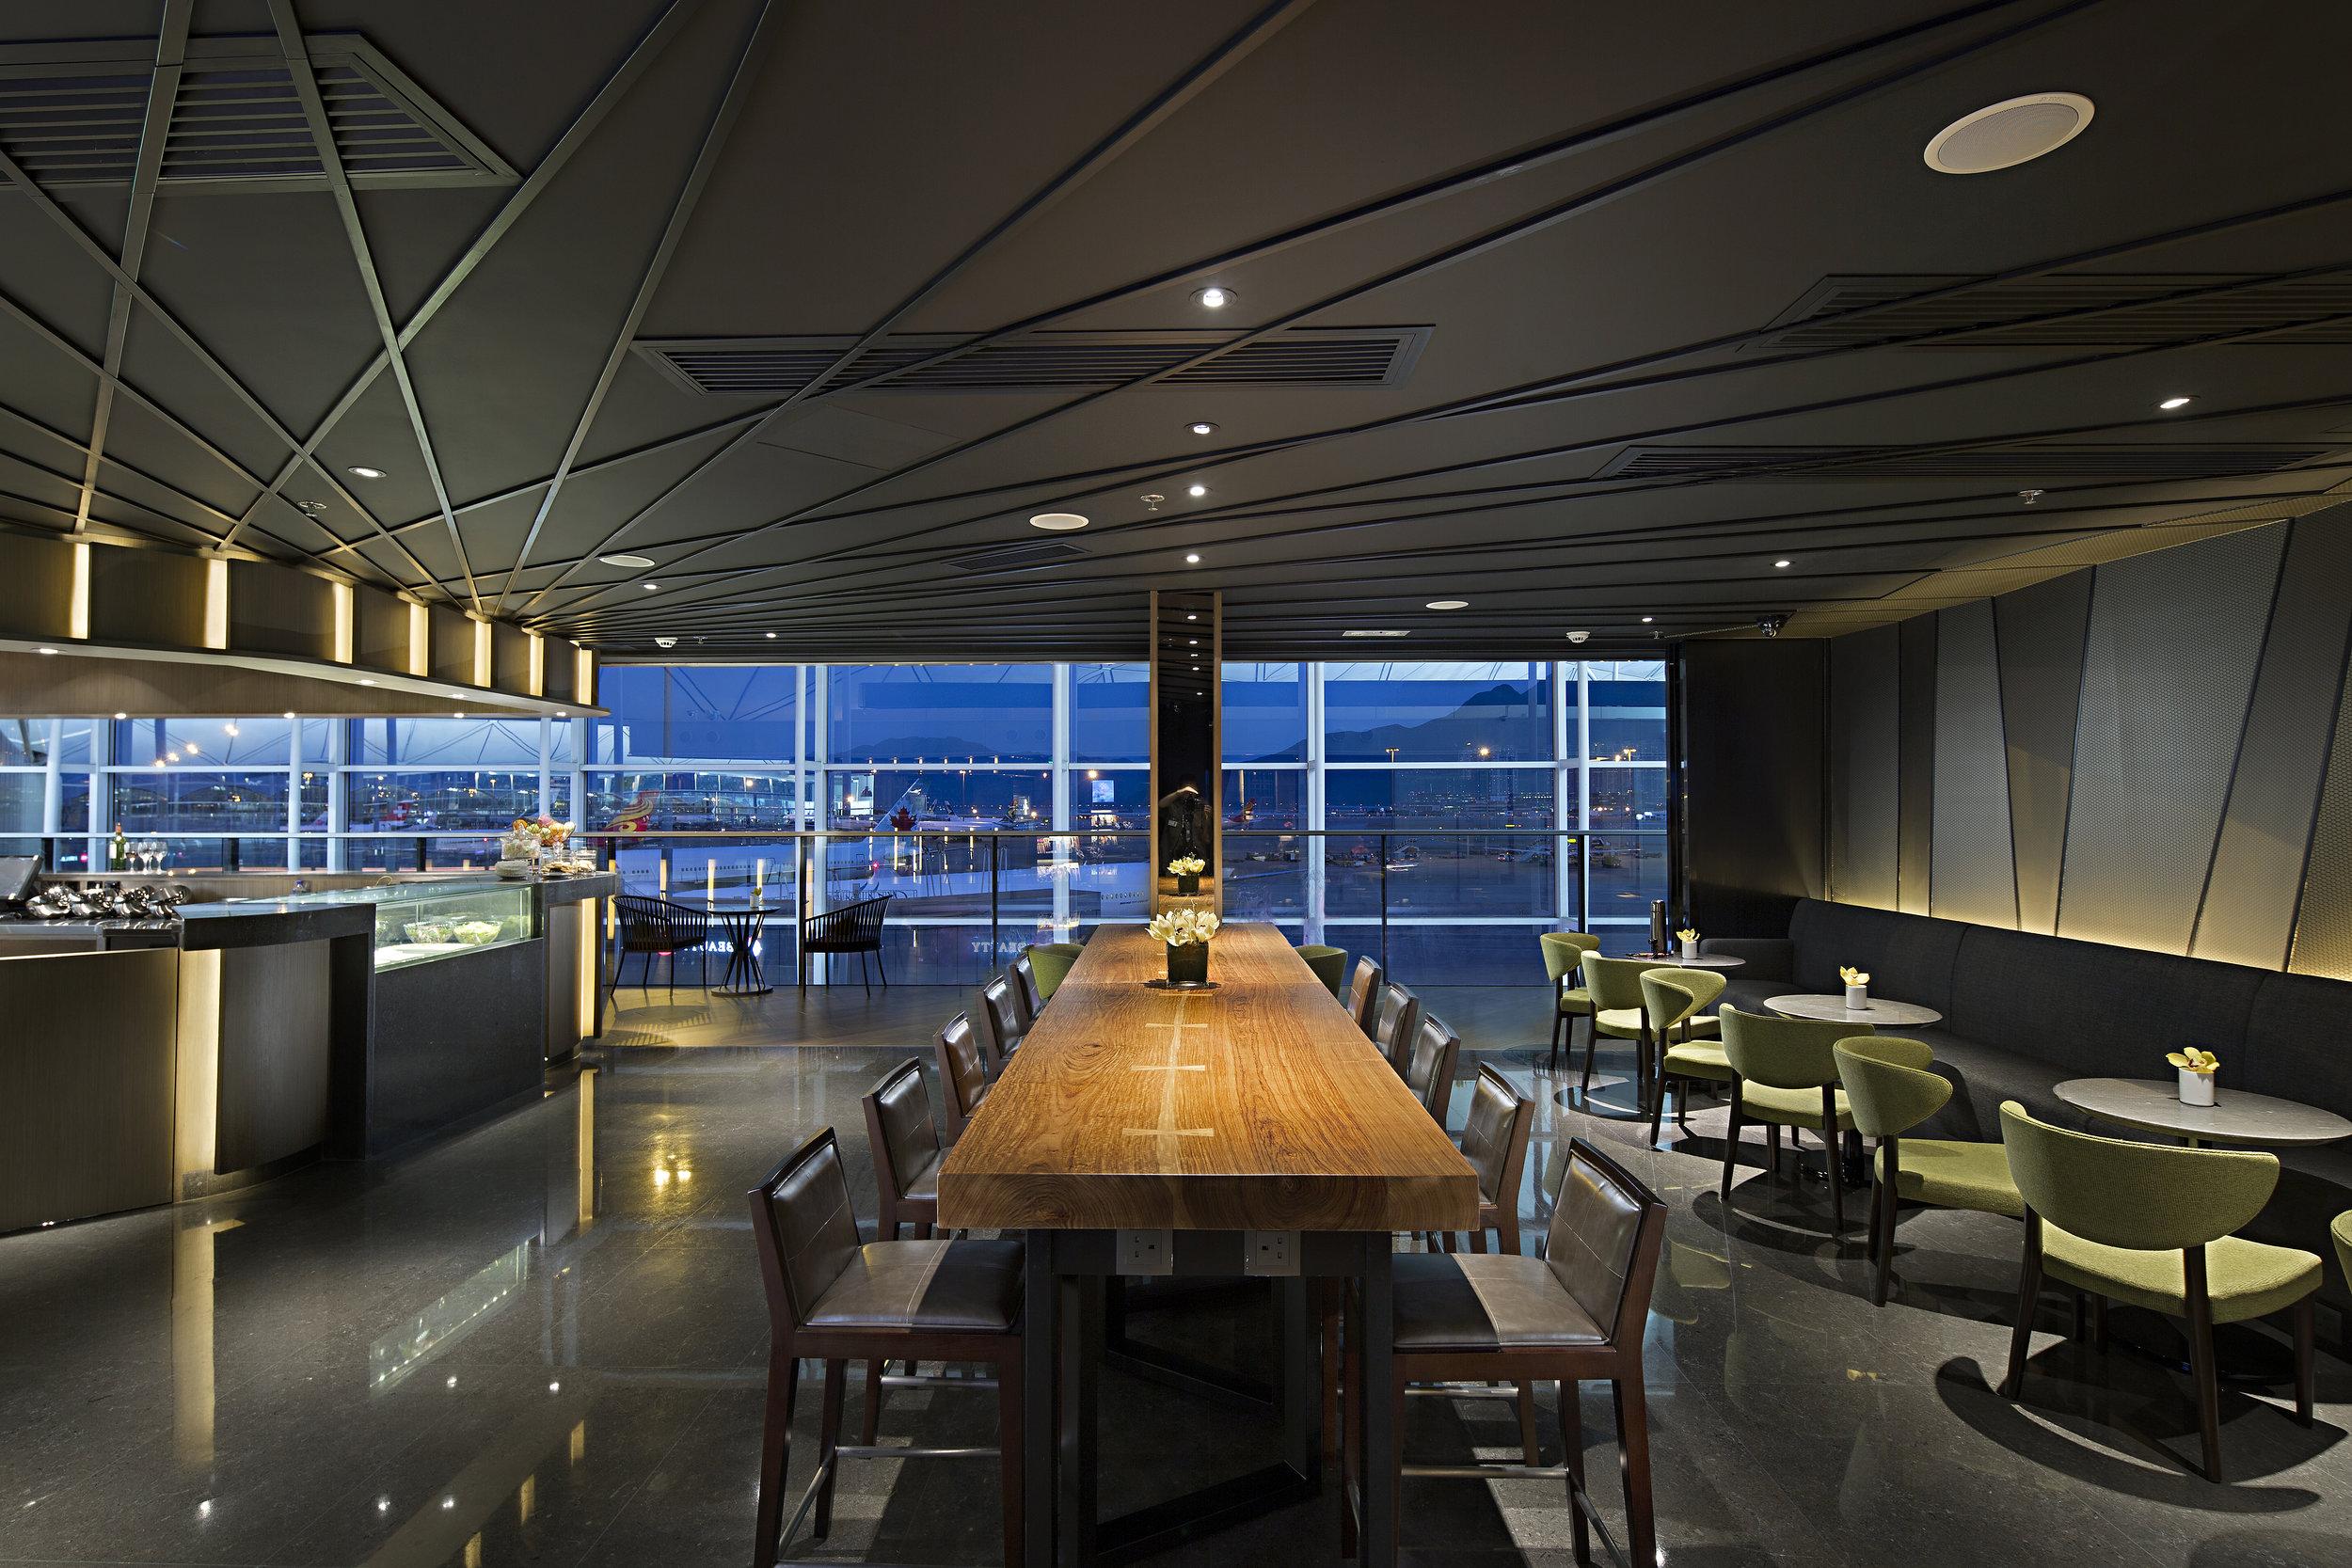 Plaza Premium Lounge (West Hall) - Hong Kong | Photo Credit: Plaza Premium Lounge